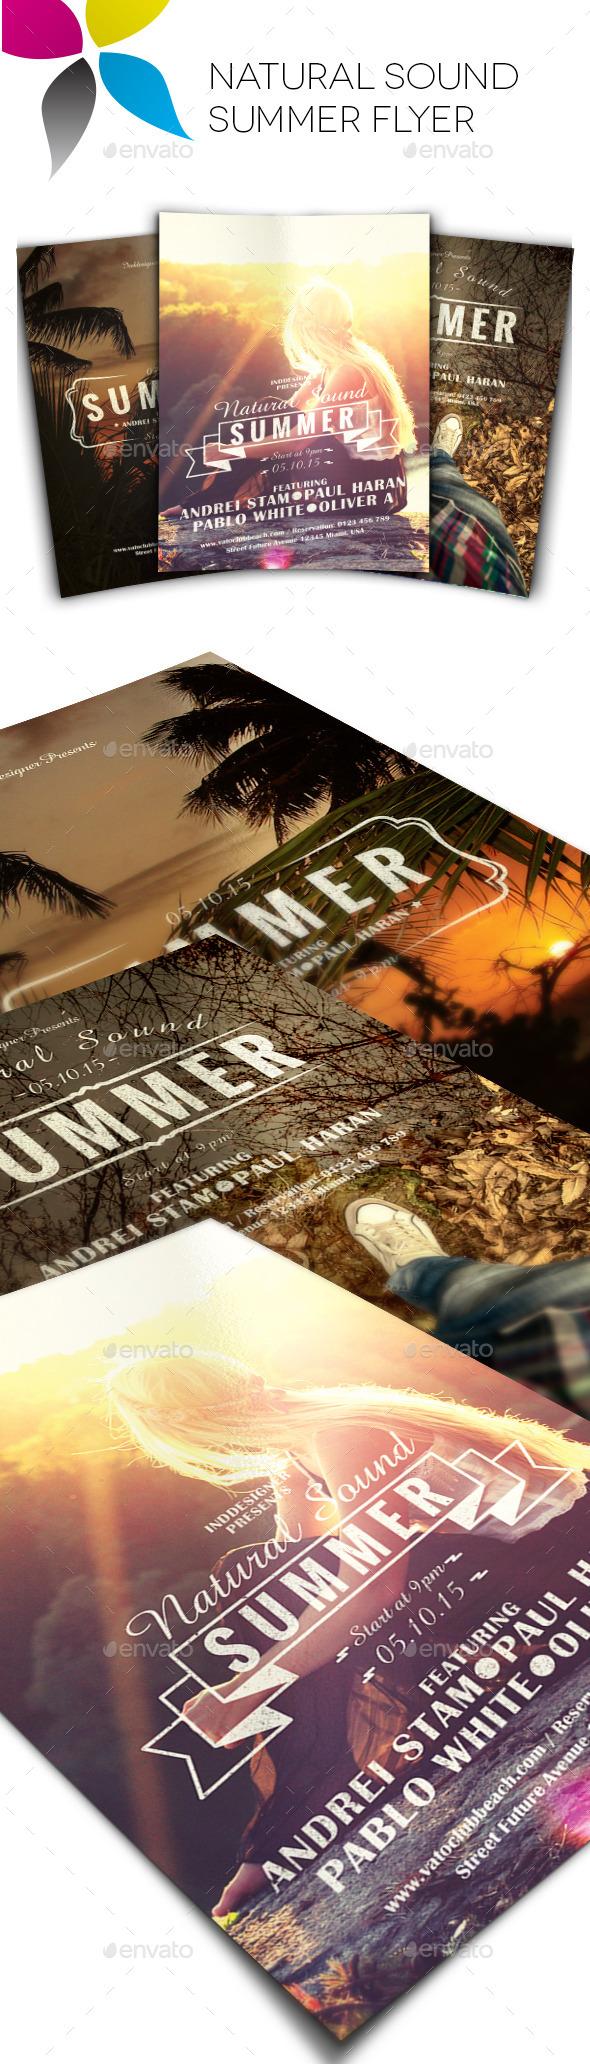 GraphicRiver Natural Sound Summer Flyer 11380998